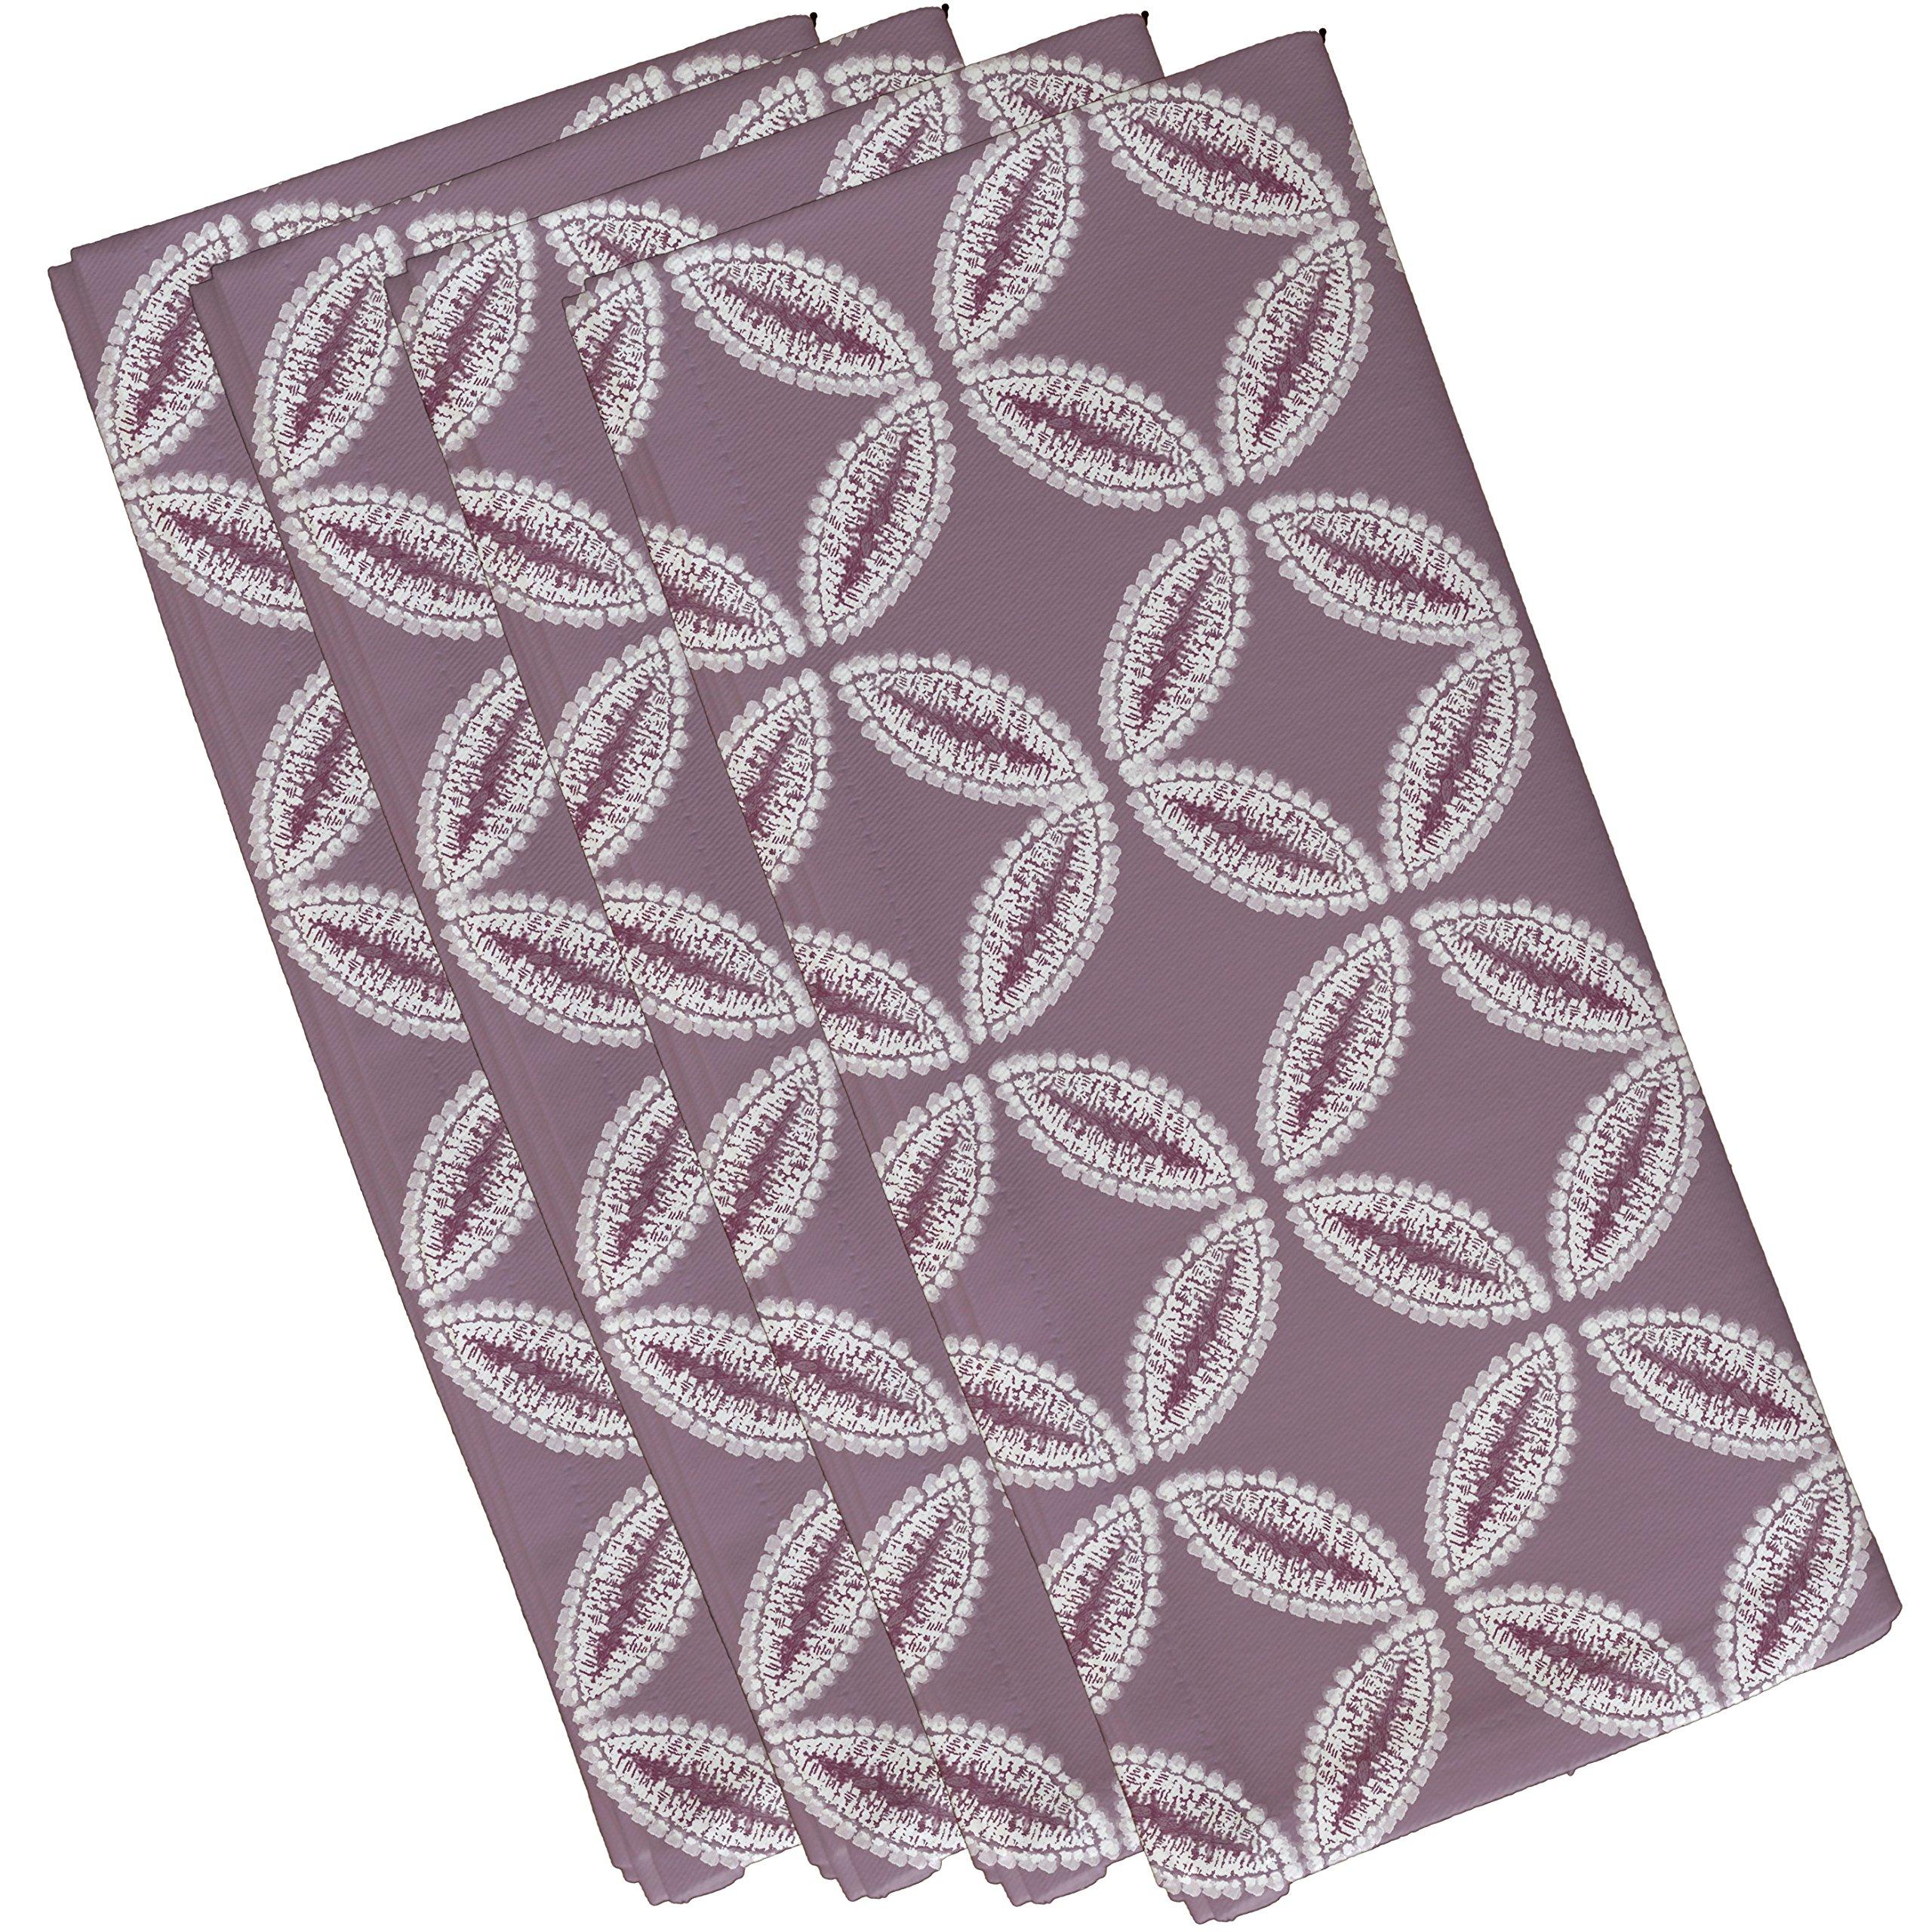 E by design N4G768PU14 Tidepool Geometric Print Napkin (Set of 4), 19'' x 19'', Lavender by E by design